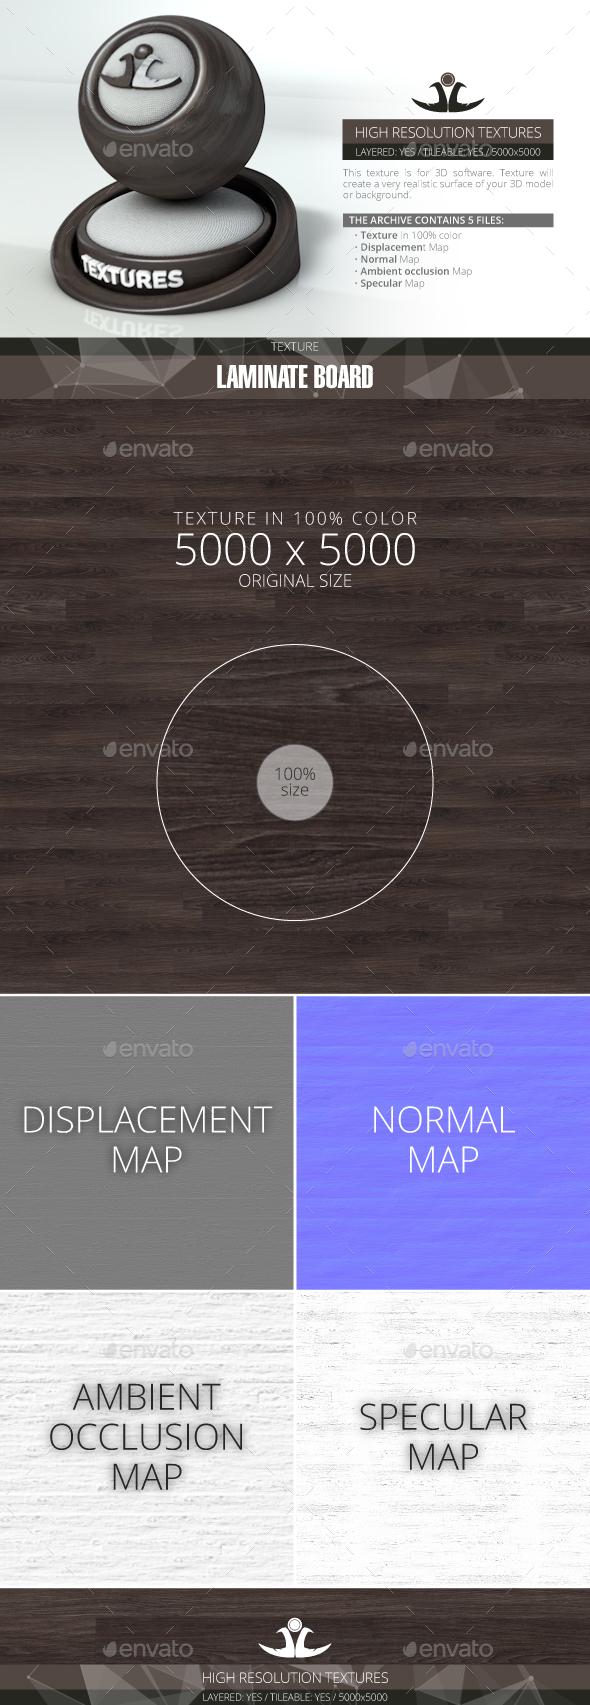 Laminate Board 17 - 3DOcean Item for Sale